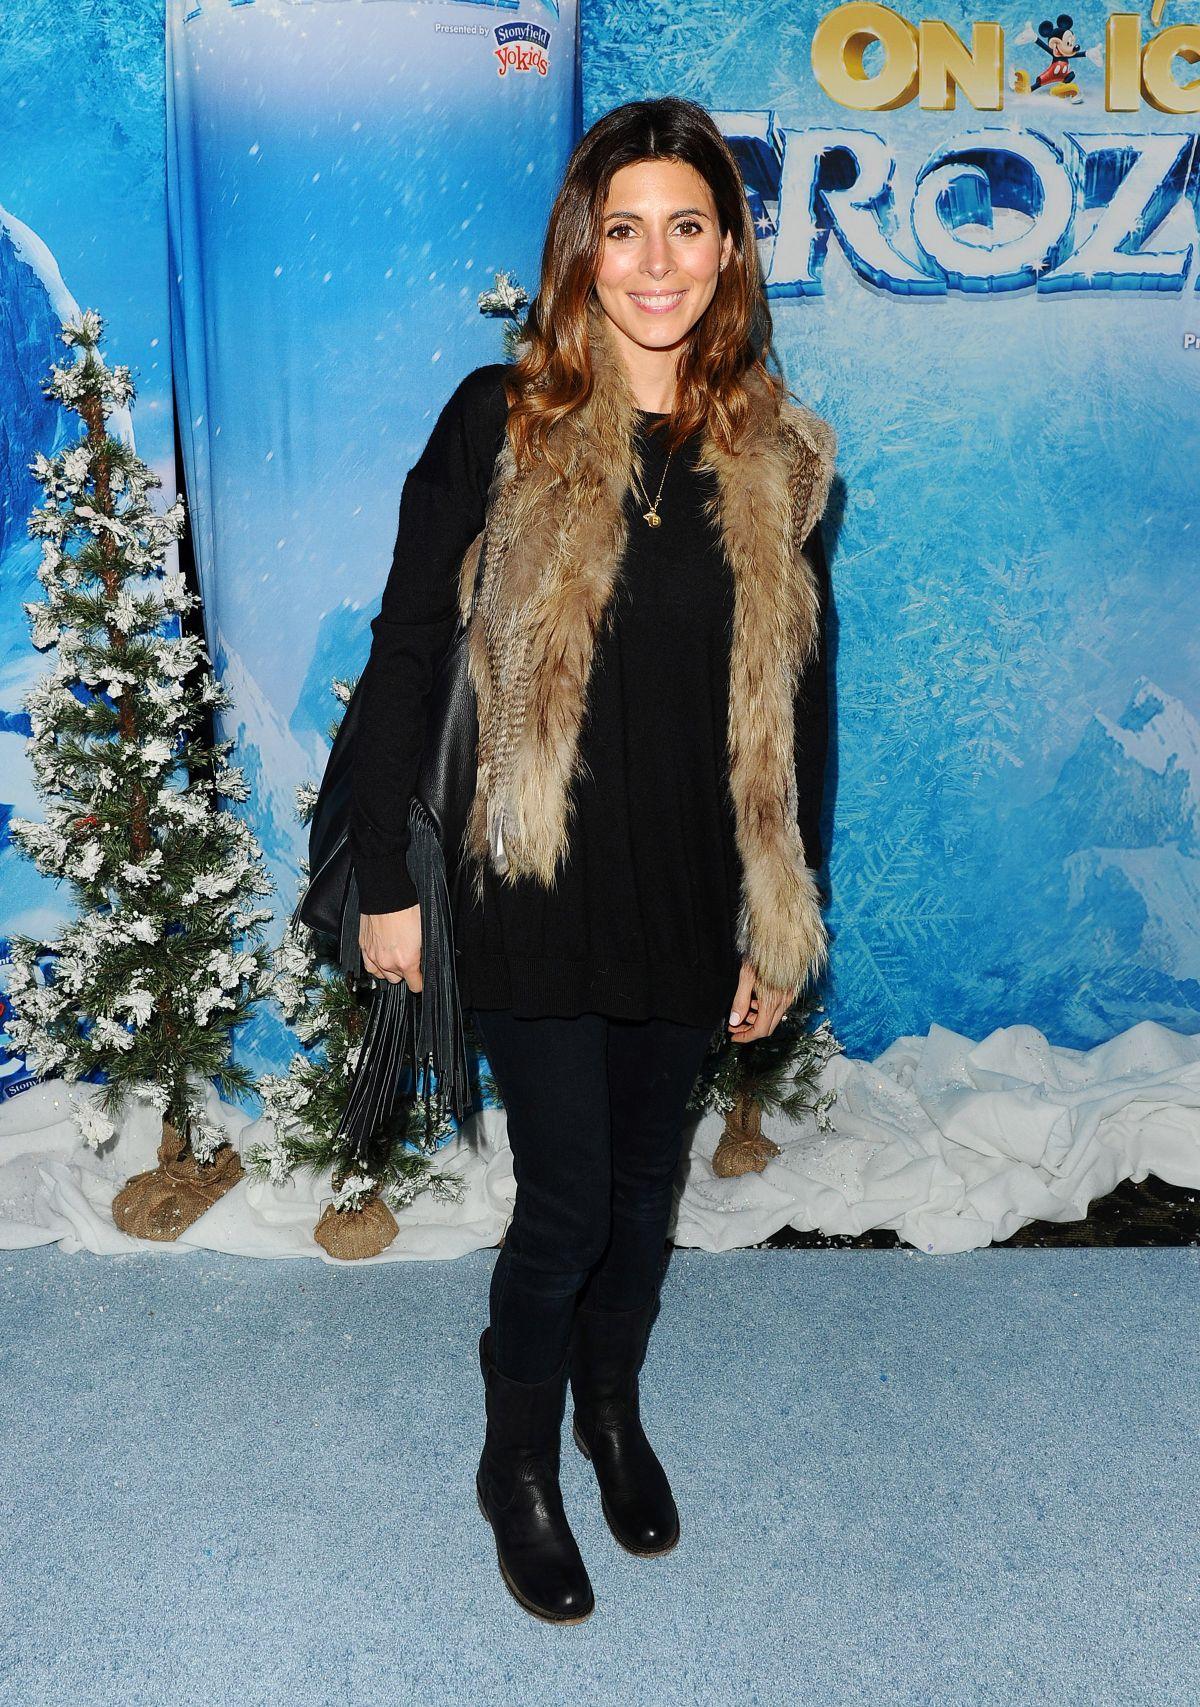 JAMIE-LYNN SIGLER at Disney on Ice in Los Angeles 12/10/2015